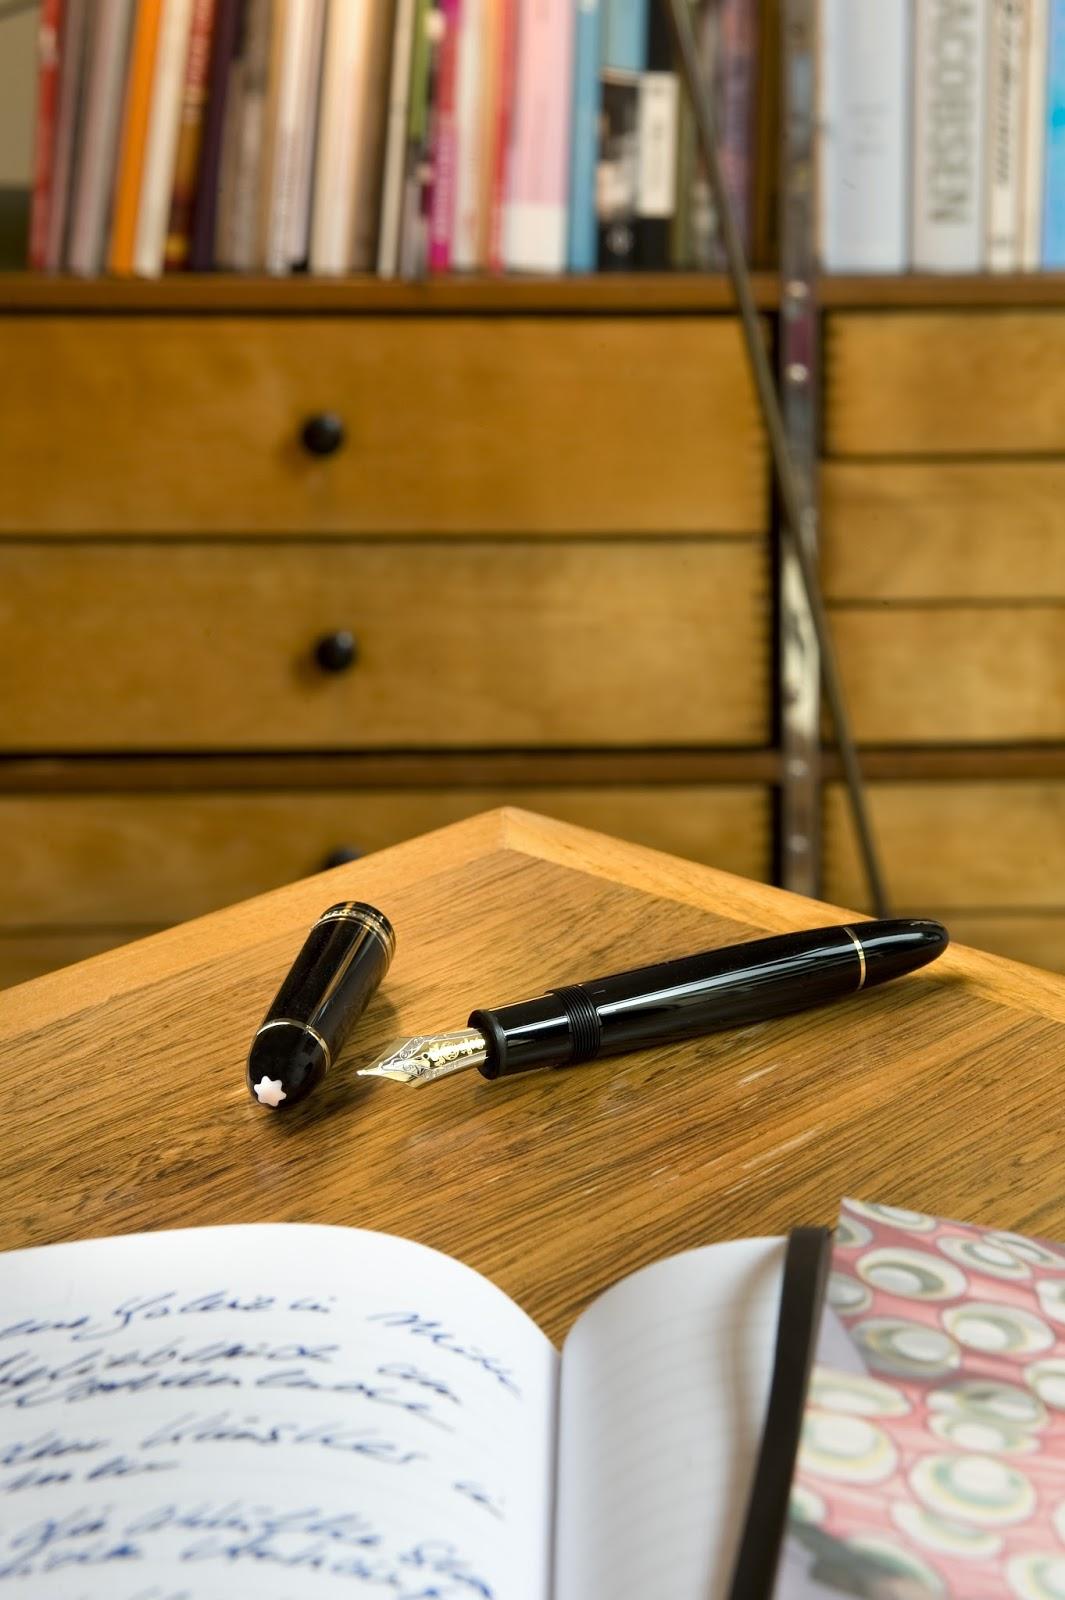 00O00 Menswear Blog: President Barack Obama and the Montblanc Meisterstück pen